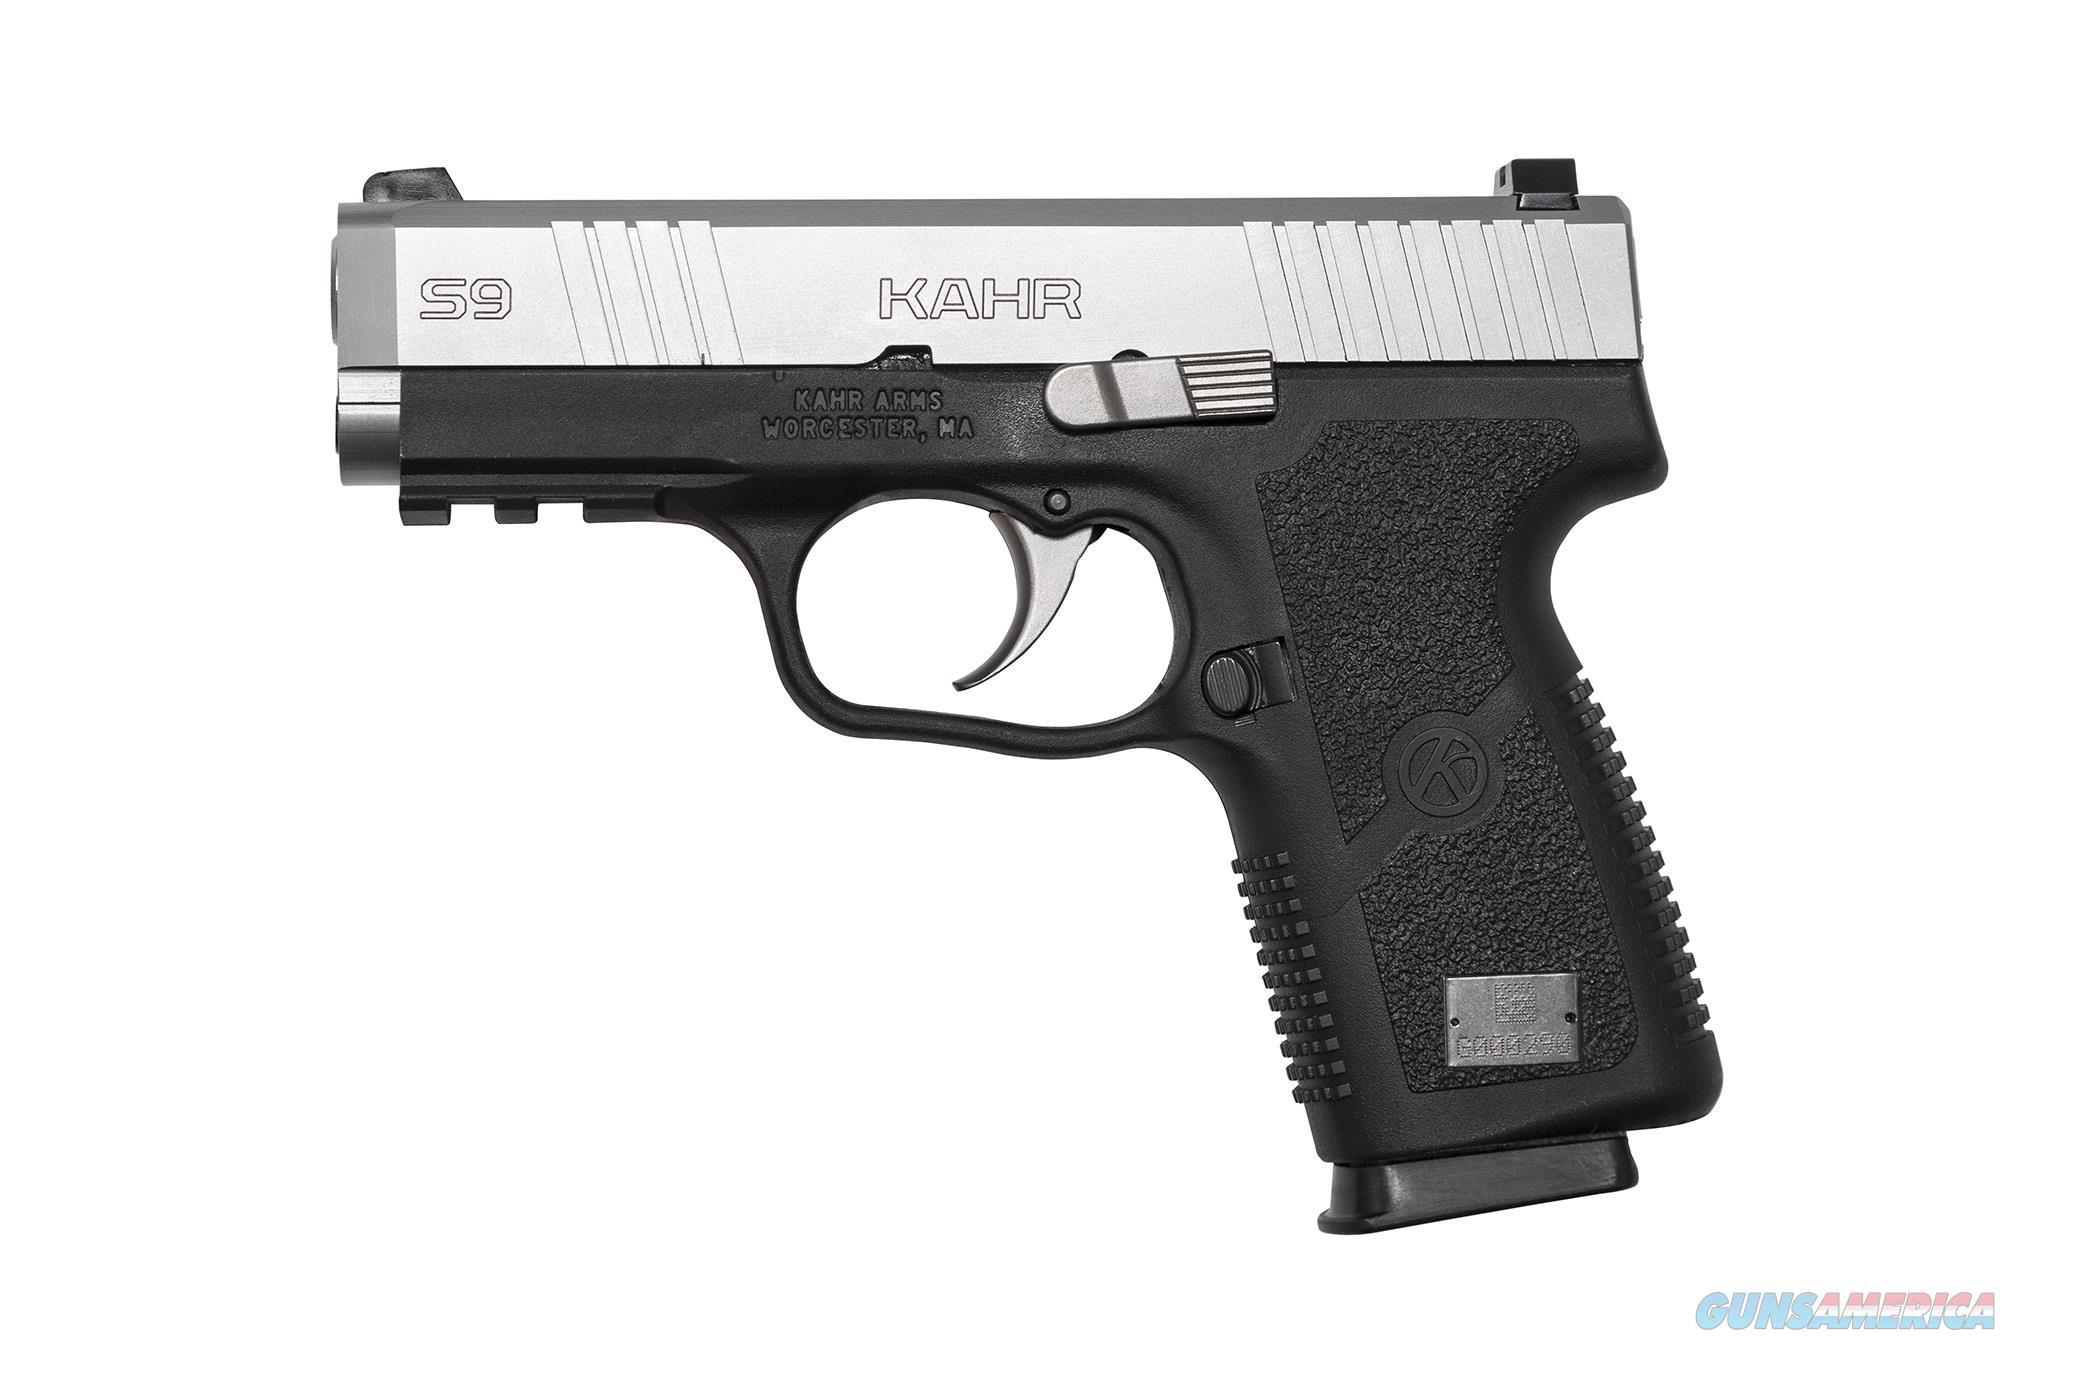 "S9 9Mm Ss/Blk 3.6"" 7+1 Rail S9093  Guns > Pistols > K Misc Pistols"